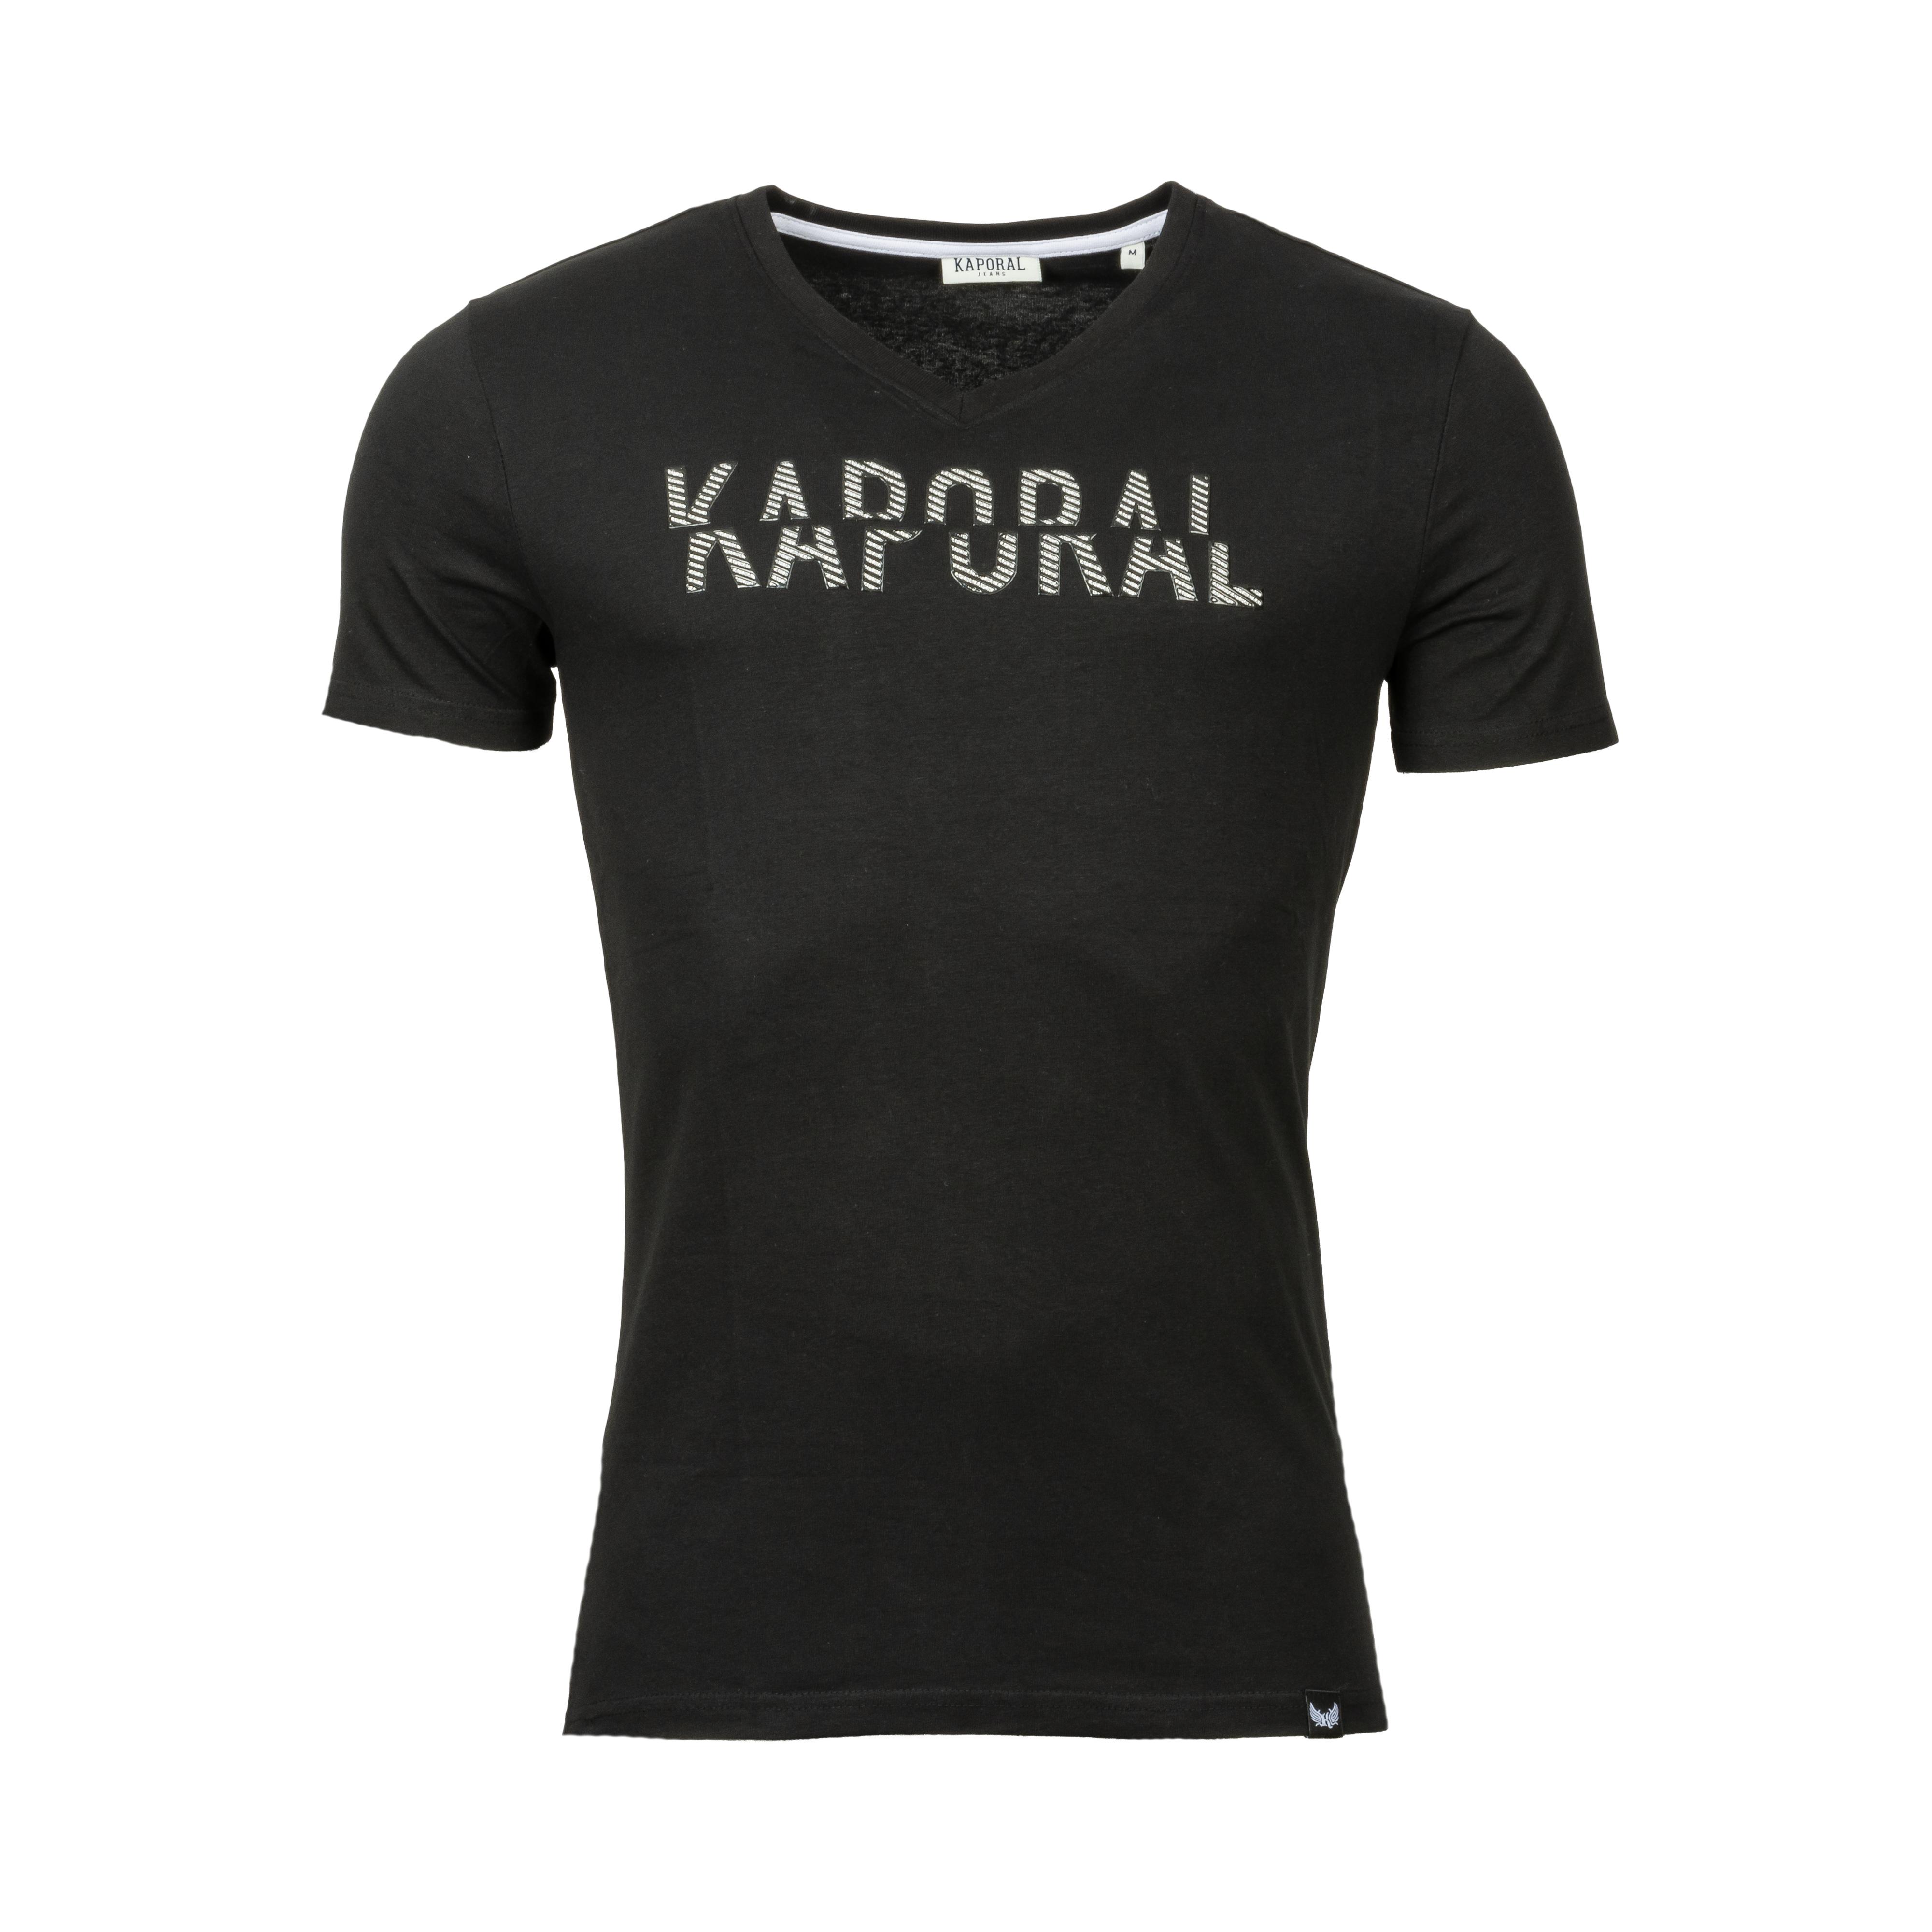 Tee-shirt col v  mocke en coton stretch noir floqué